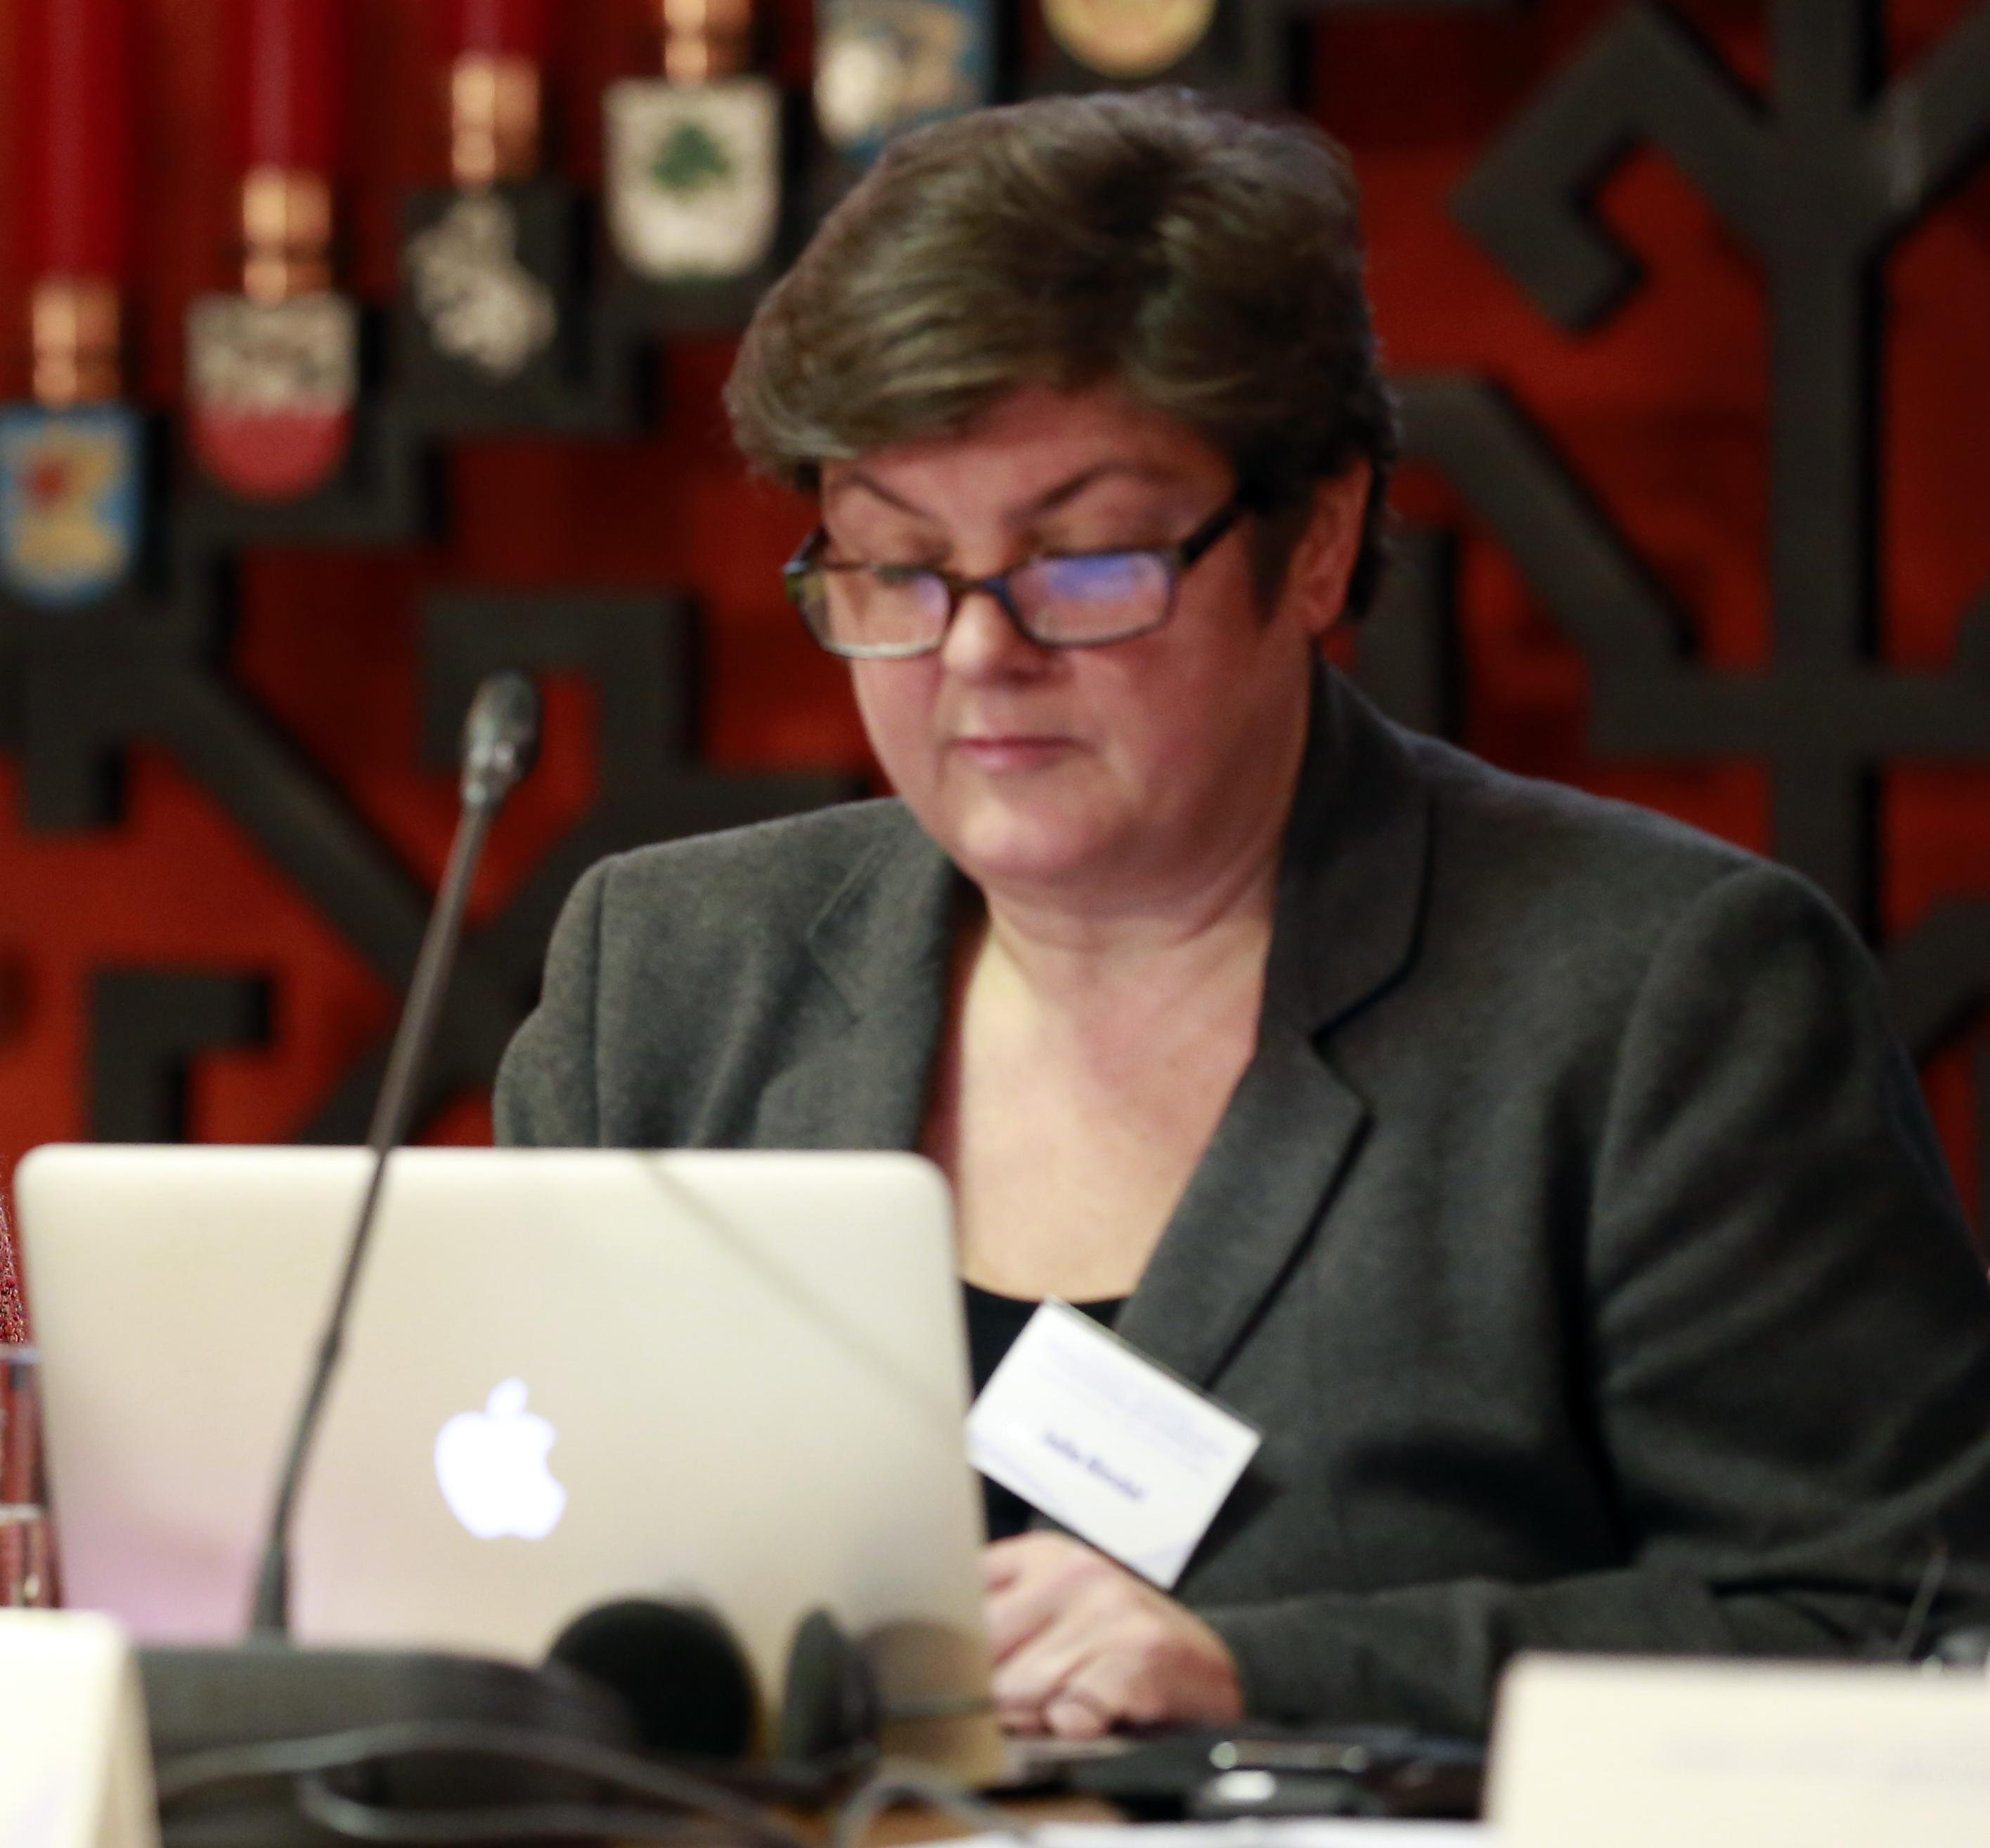 Julie Ben 10 Shemale Porn - Julie Bindel - Wikipedia